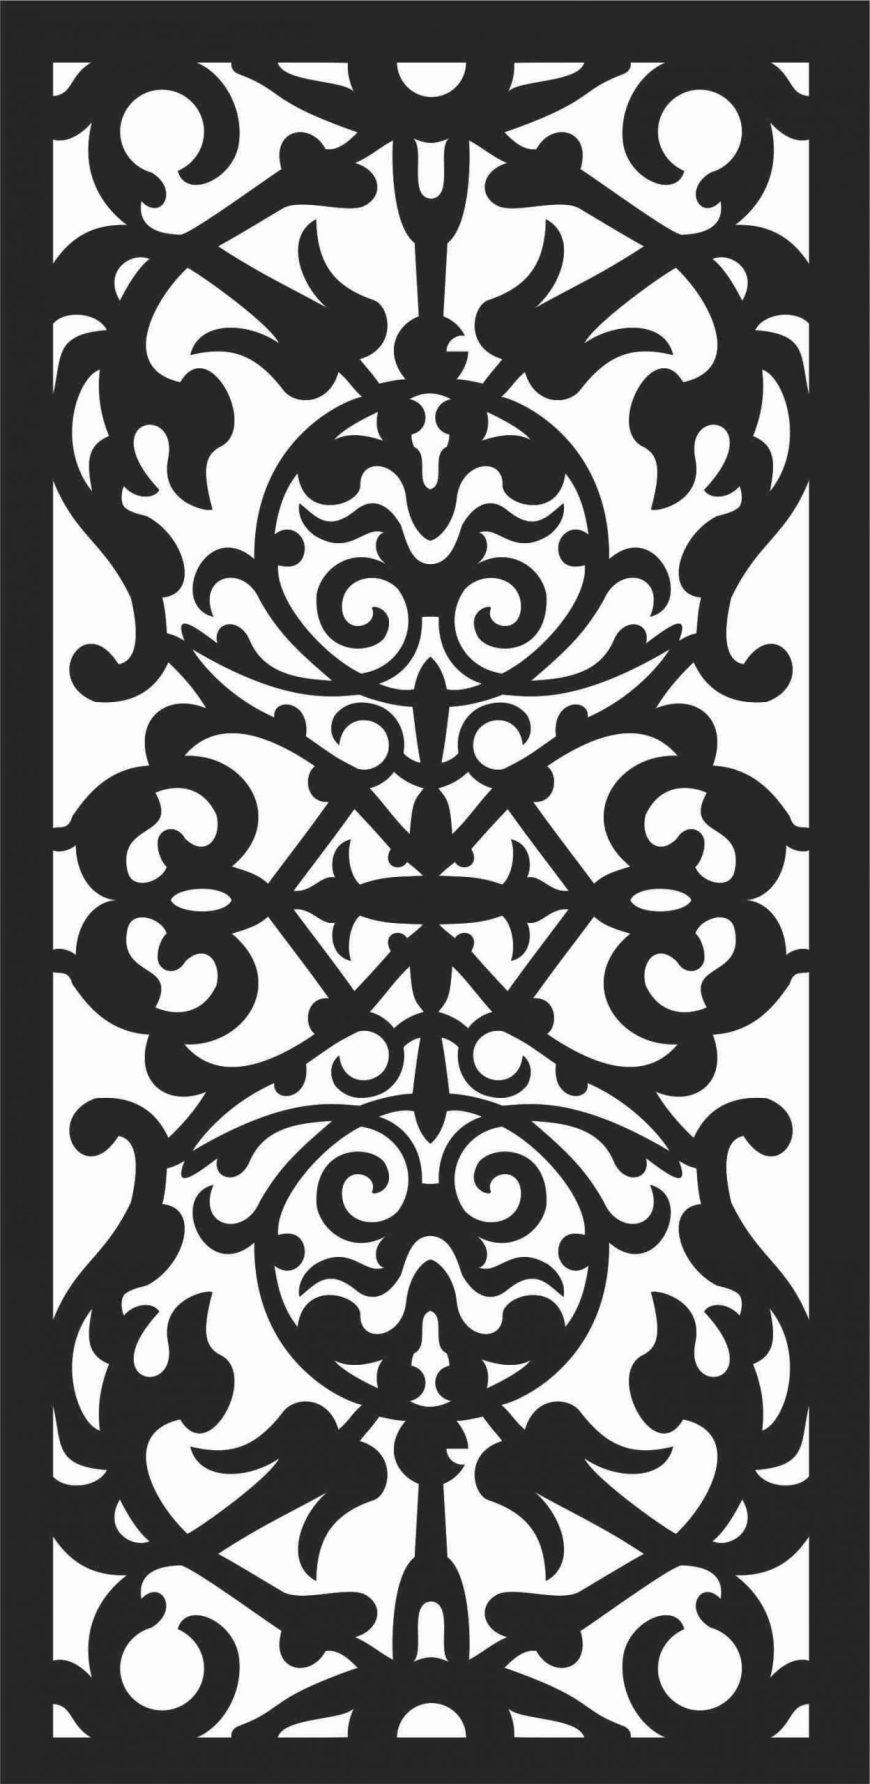 Screen Panel Patterns Seamless 55 Free DXF File